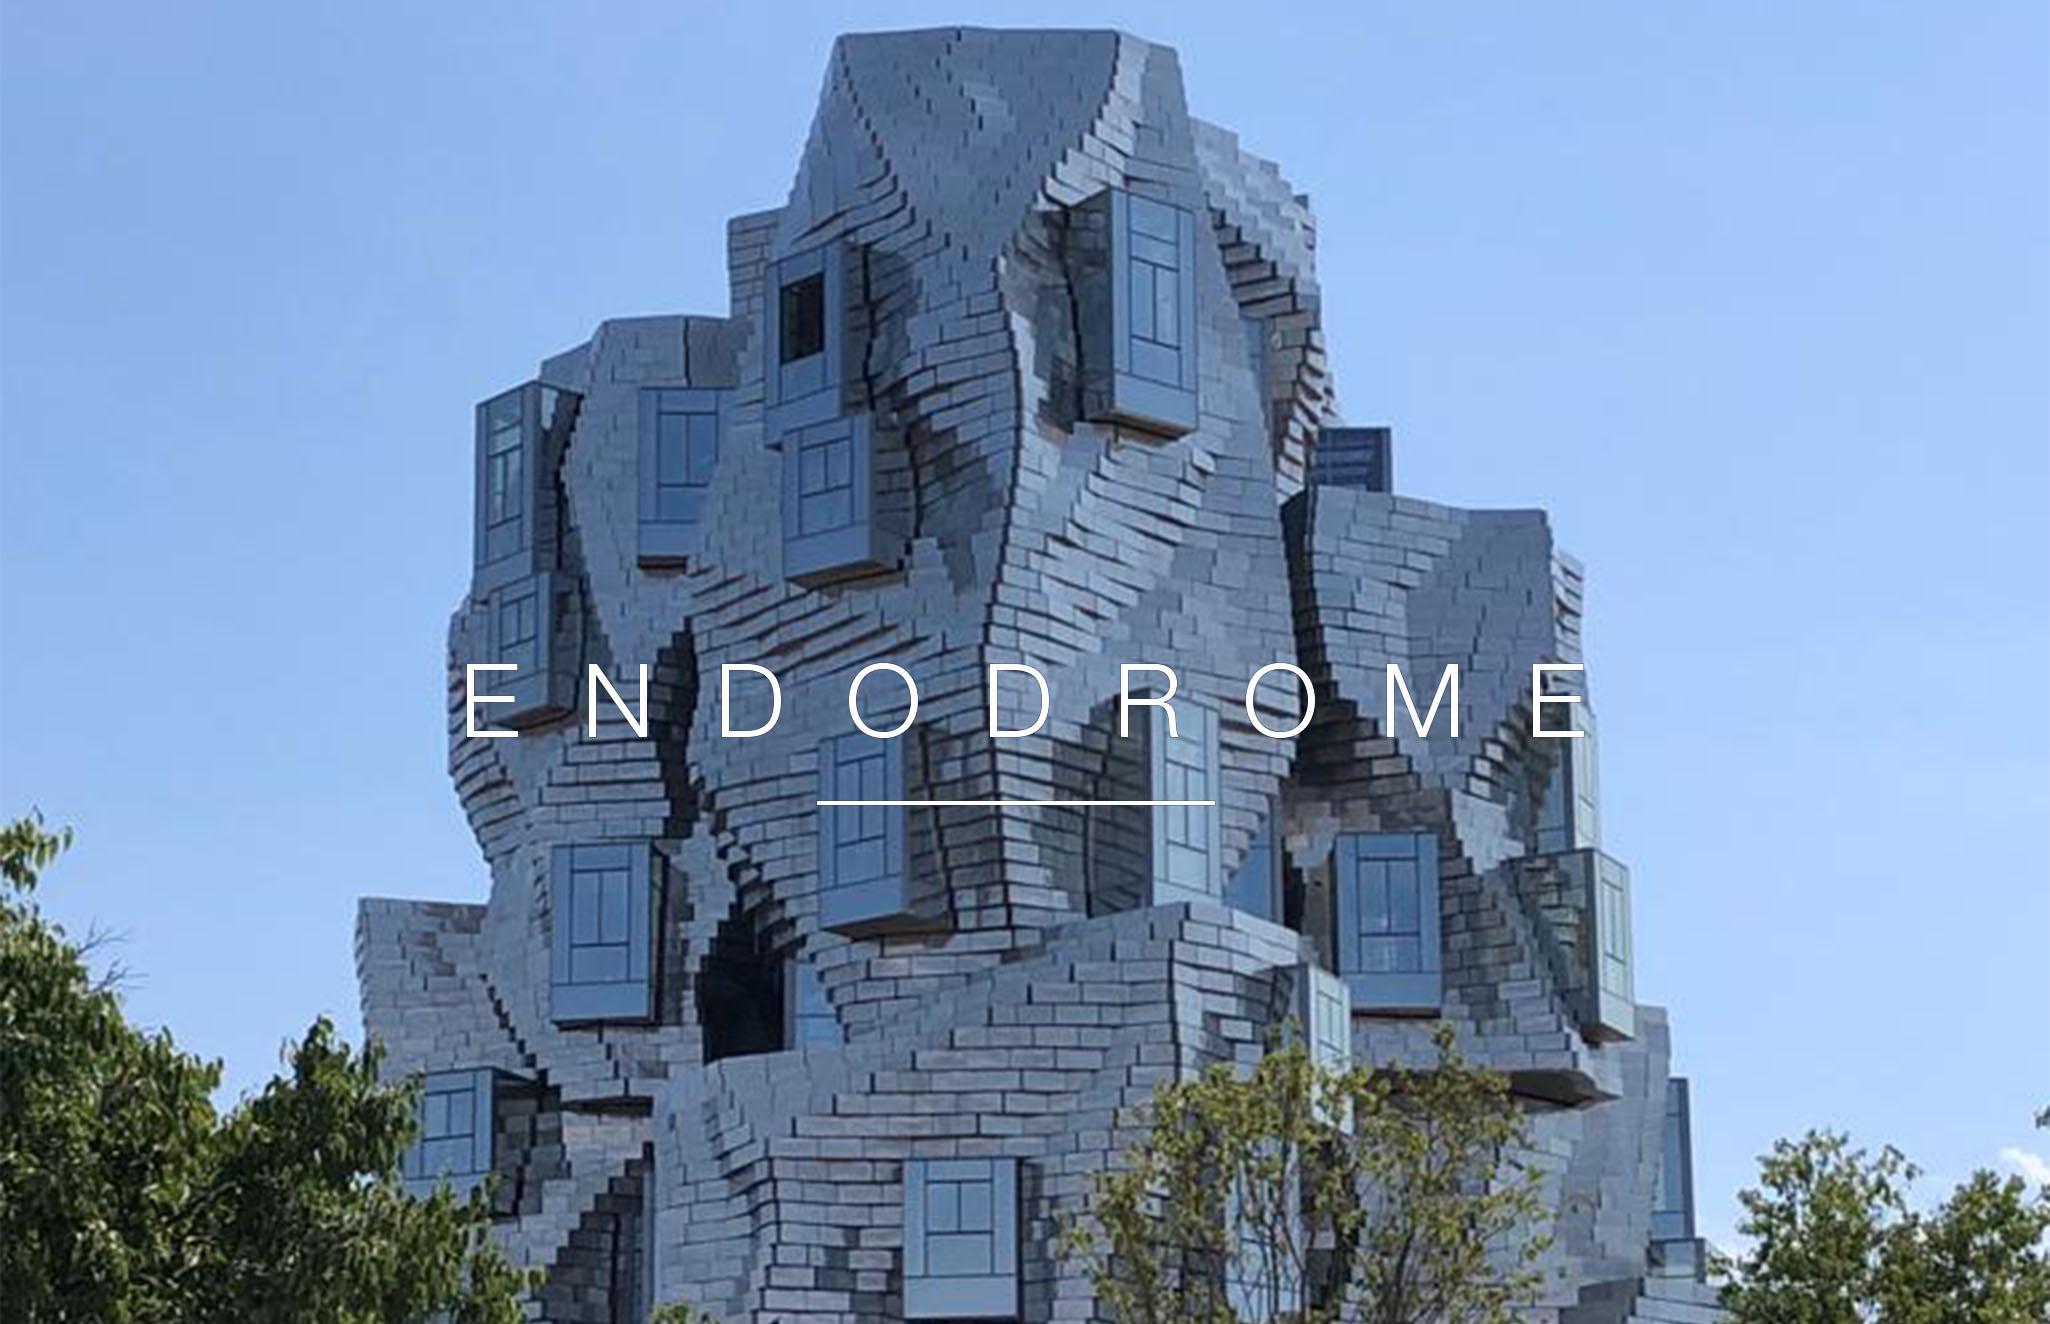 Endodrome at the LUMA Foundation in Arles